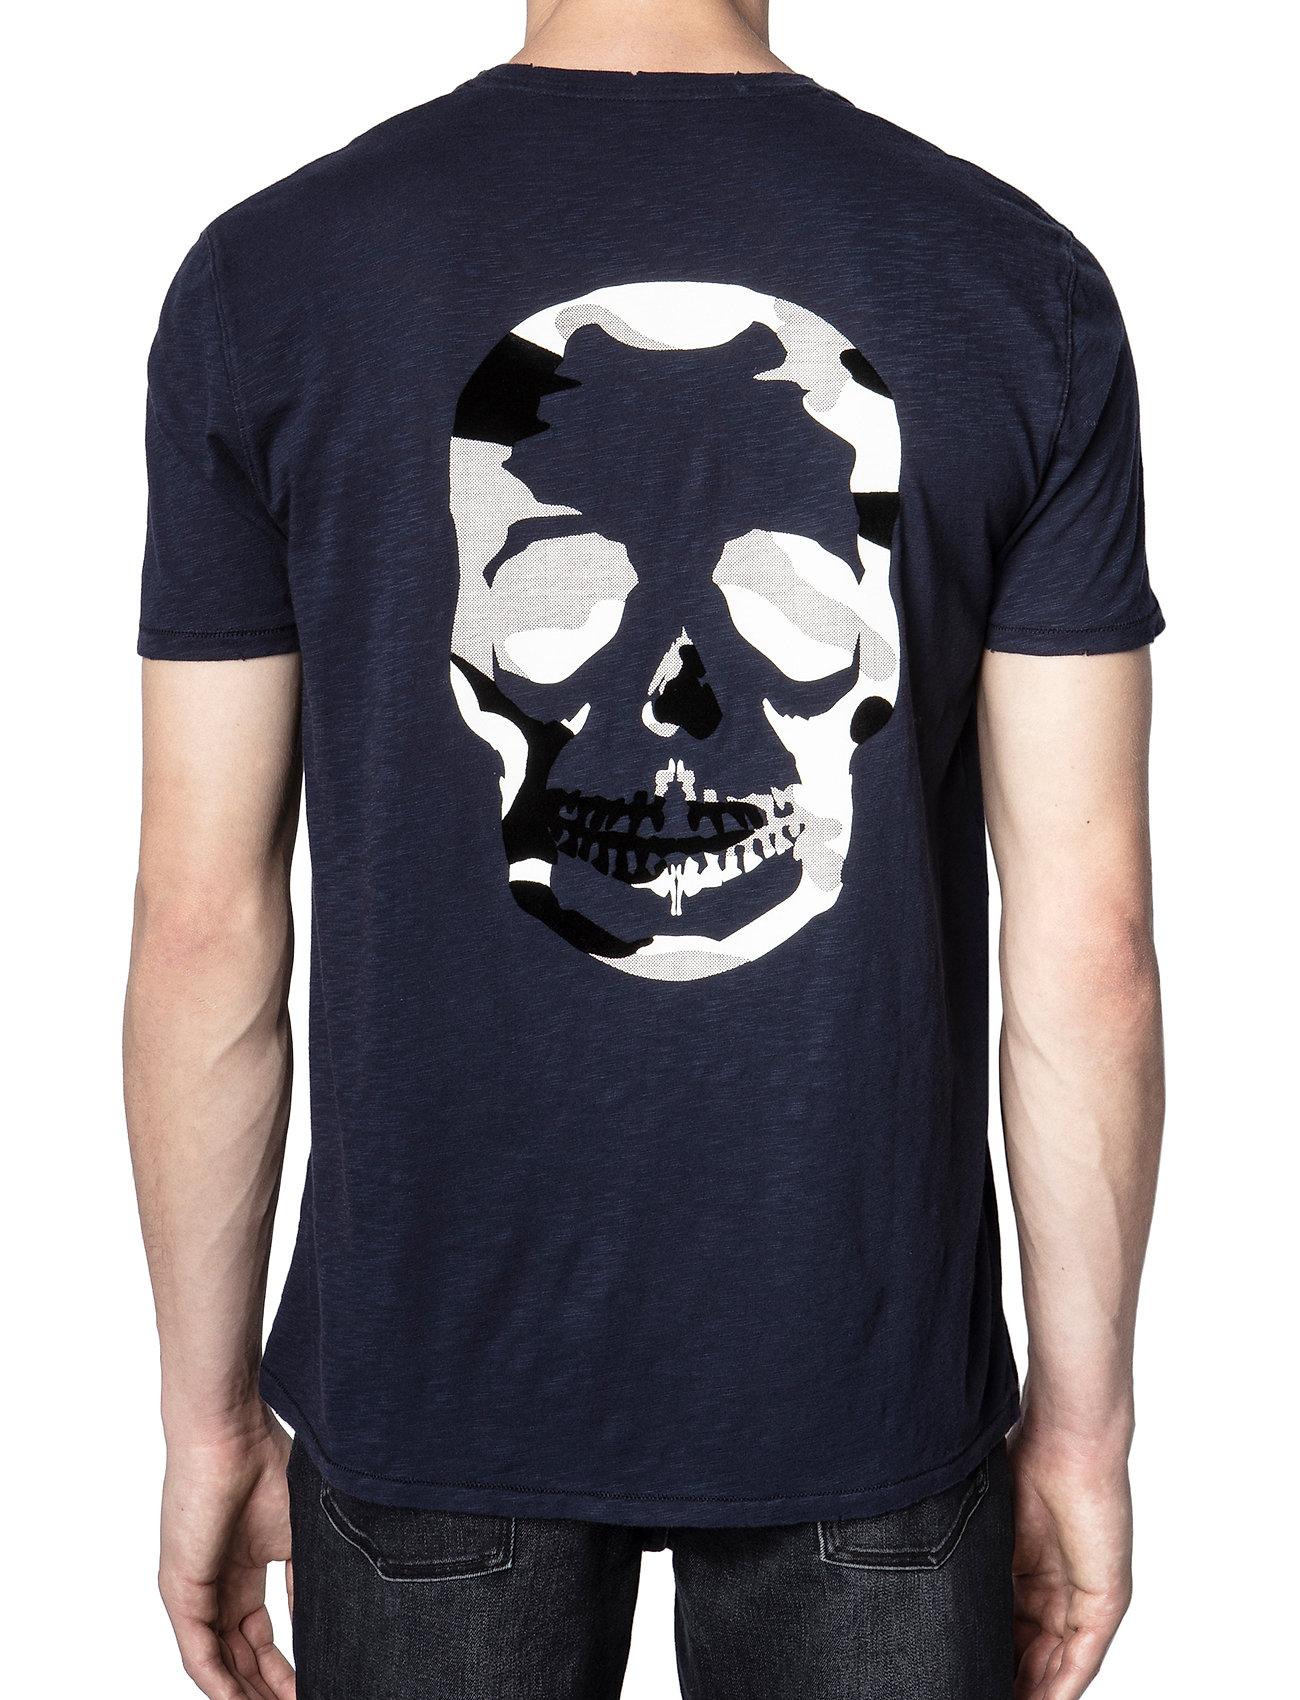 Zadig & Voltaire - STOCKHOLM COTTON SLUB - basic t-shirts - navy blue - 3